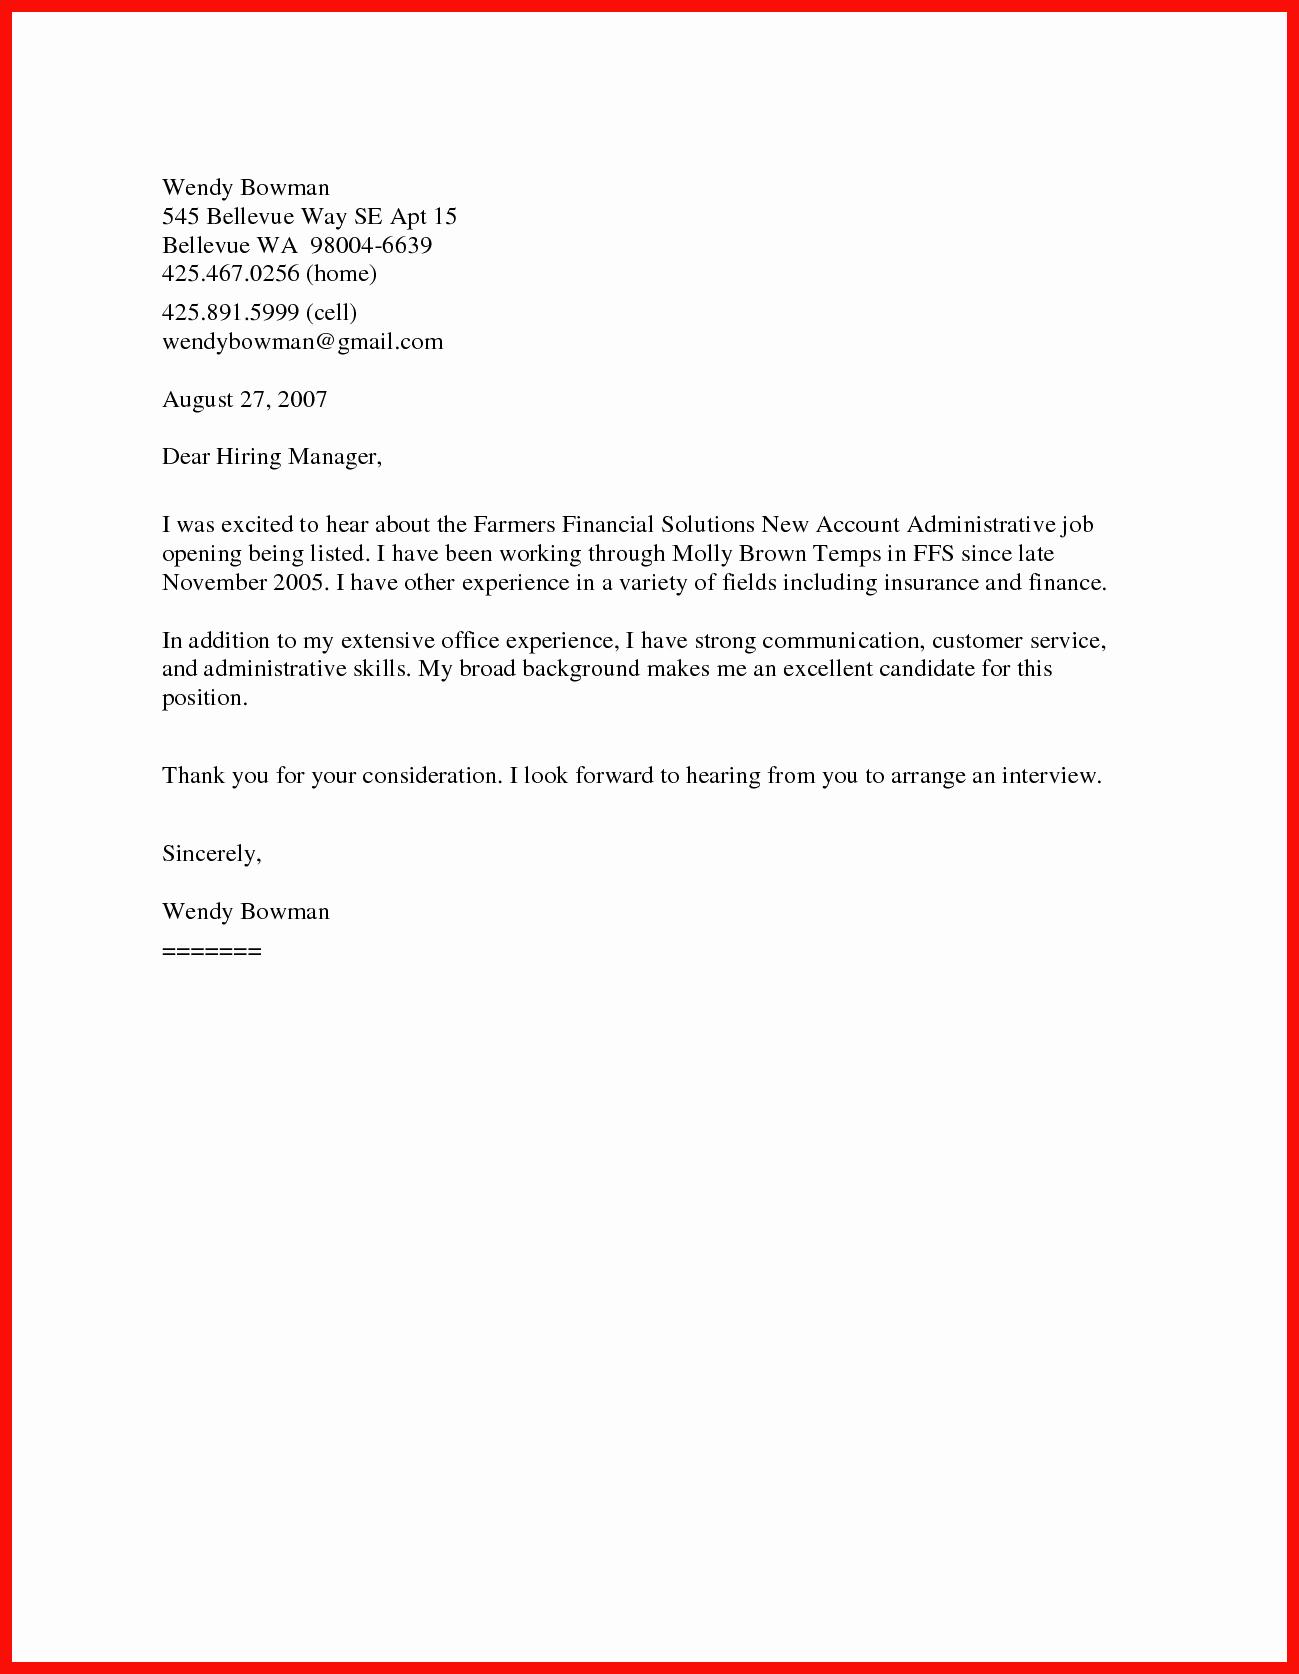 Resume Cover Letter Templates Free Luxury Short Cover Letter Sample